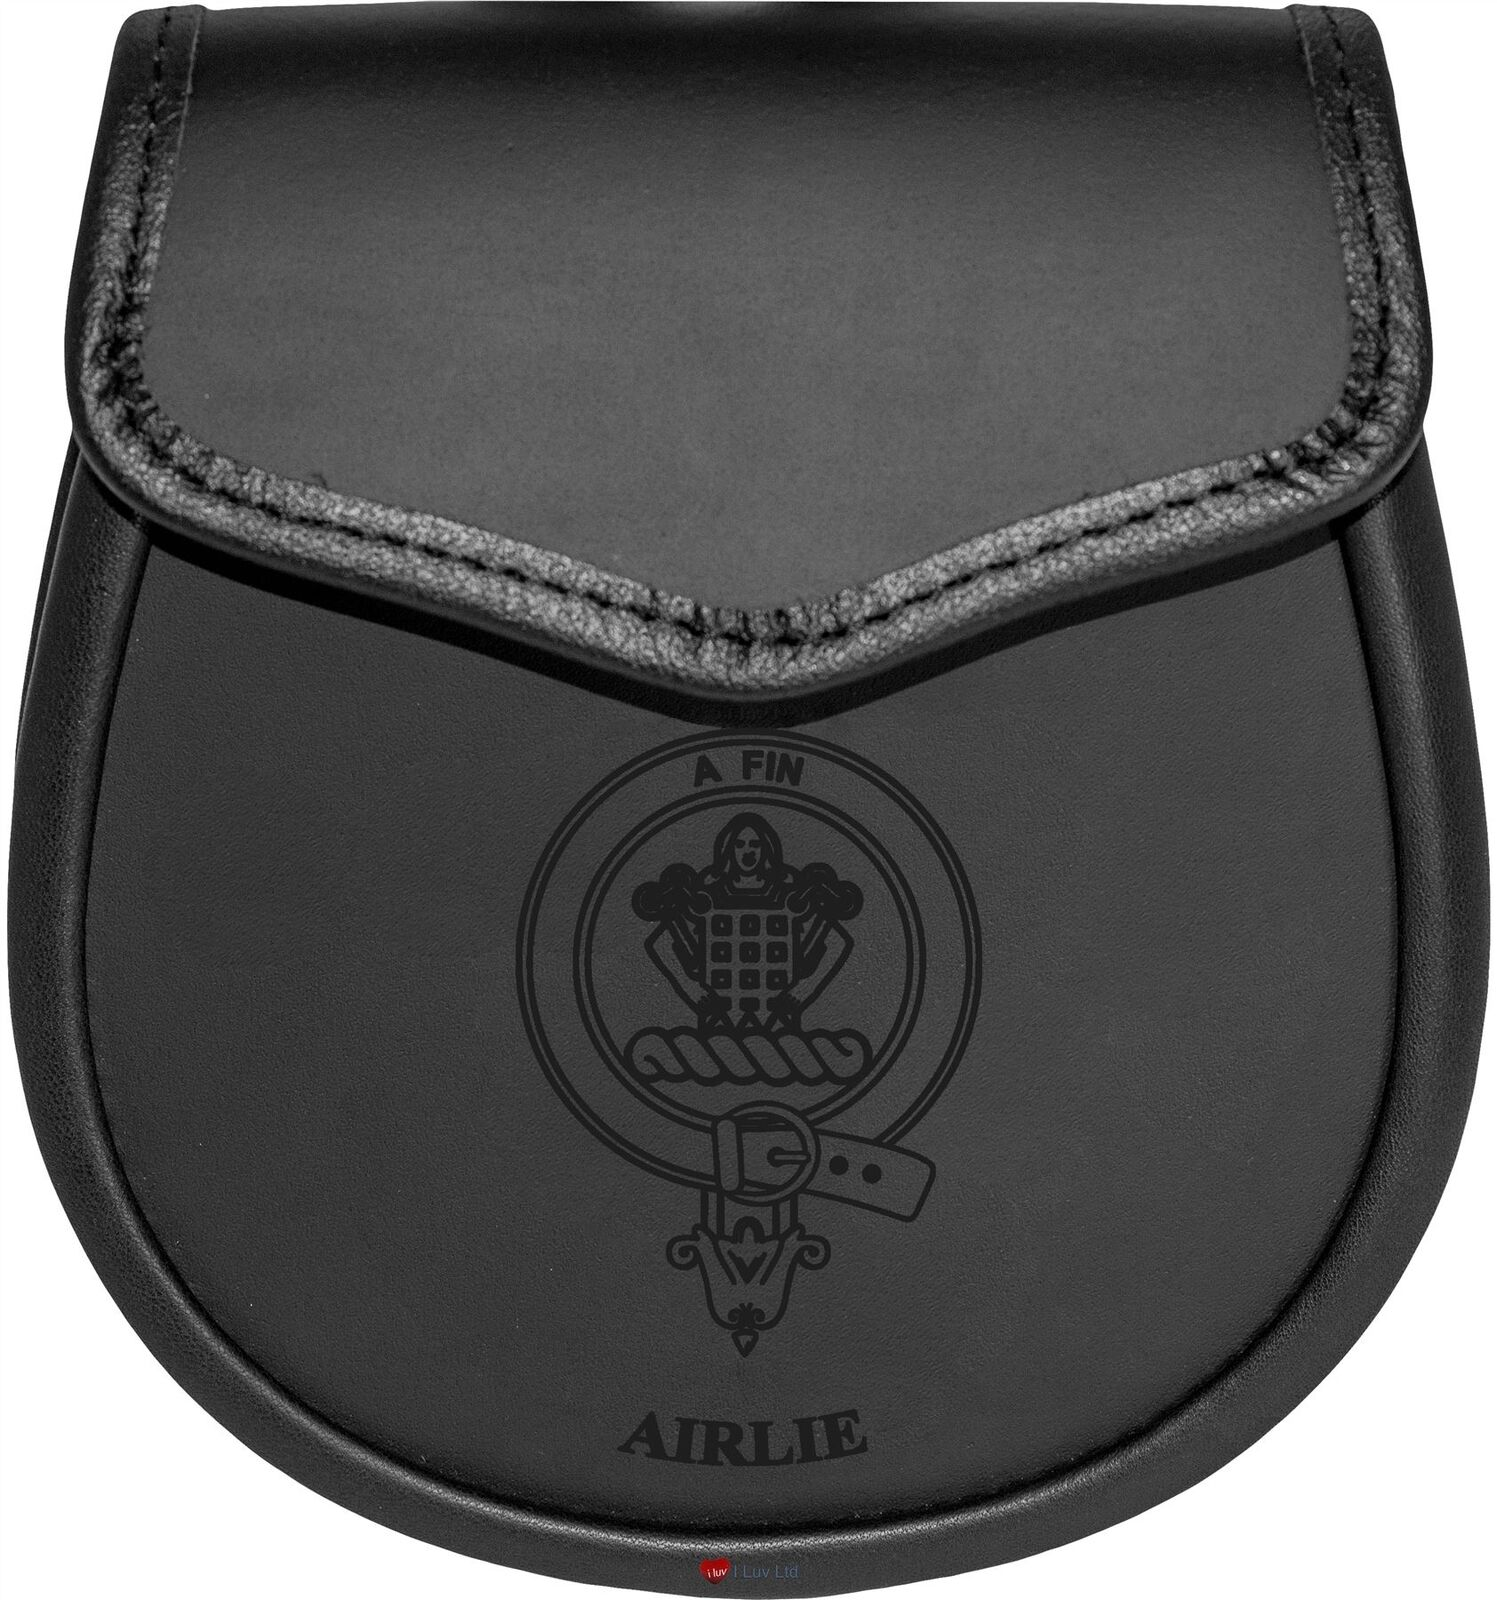 Airlie Leather Day Sporran Scottish Clan Crest